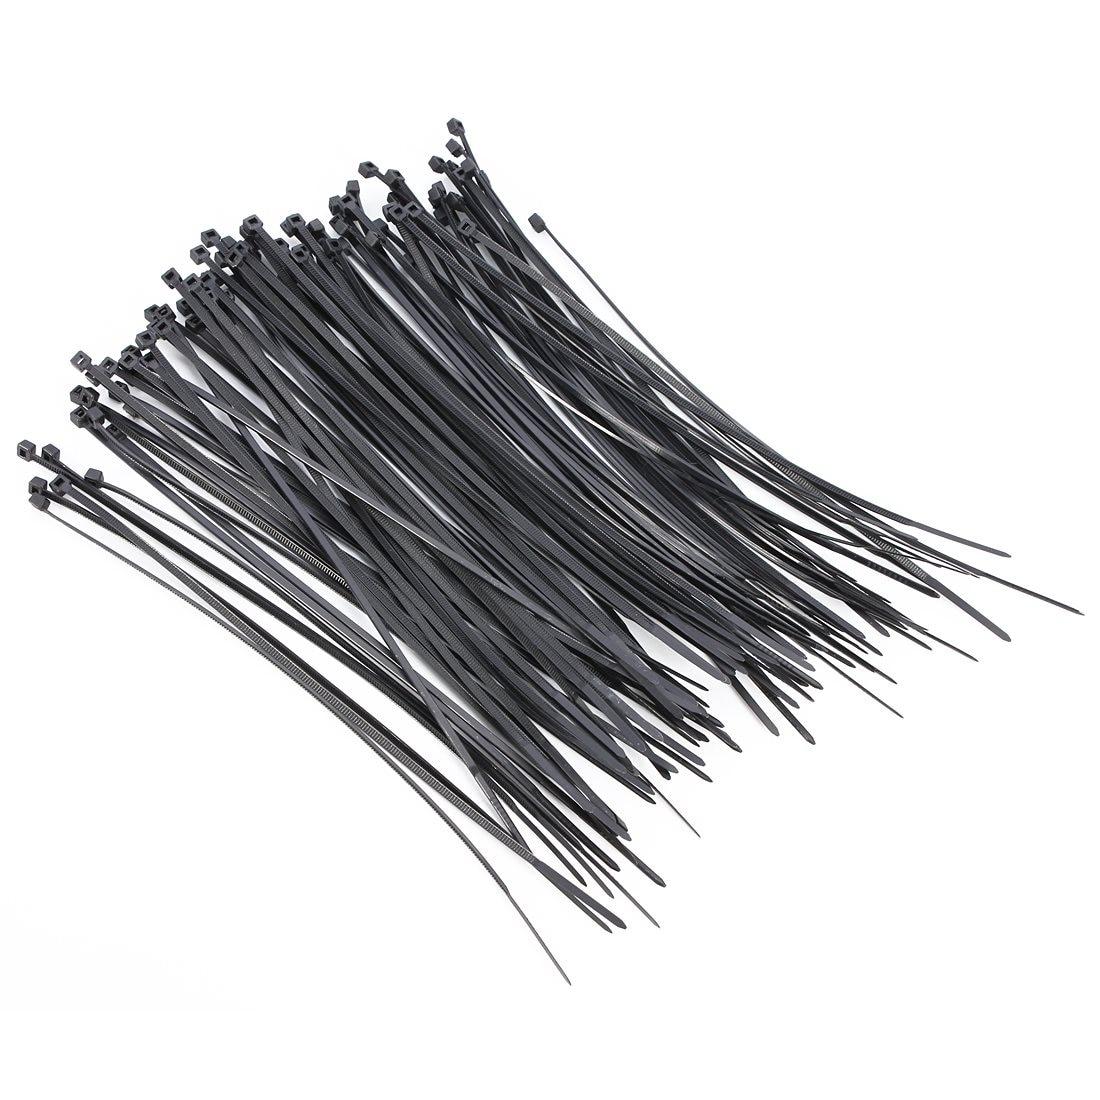 OUTERDO 100 stücke Nylon Kunststoff Zip Trim Wrap Kabel ...